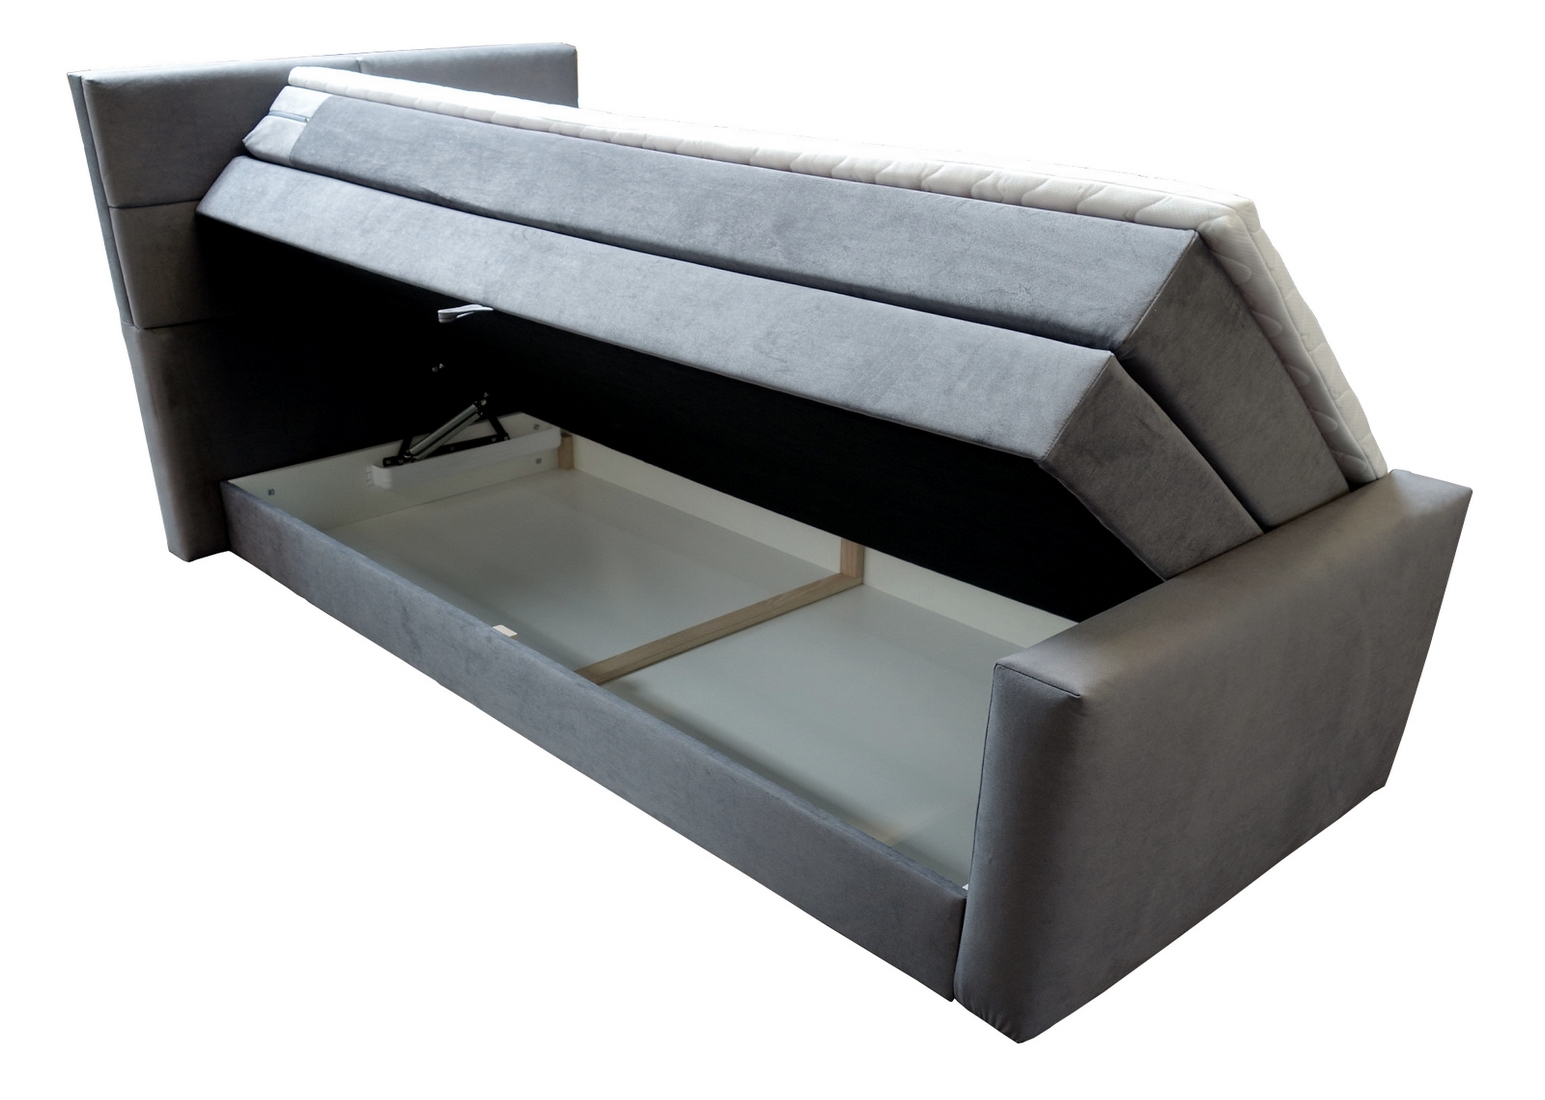 Boxspringbett mit Bettkasten 120x200 Nr.1902